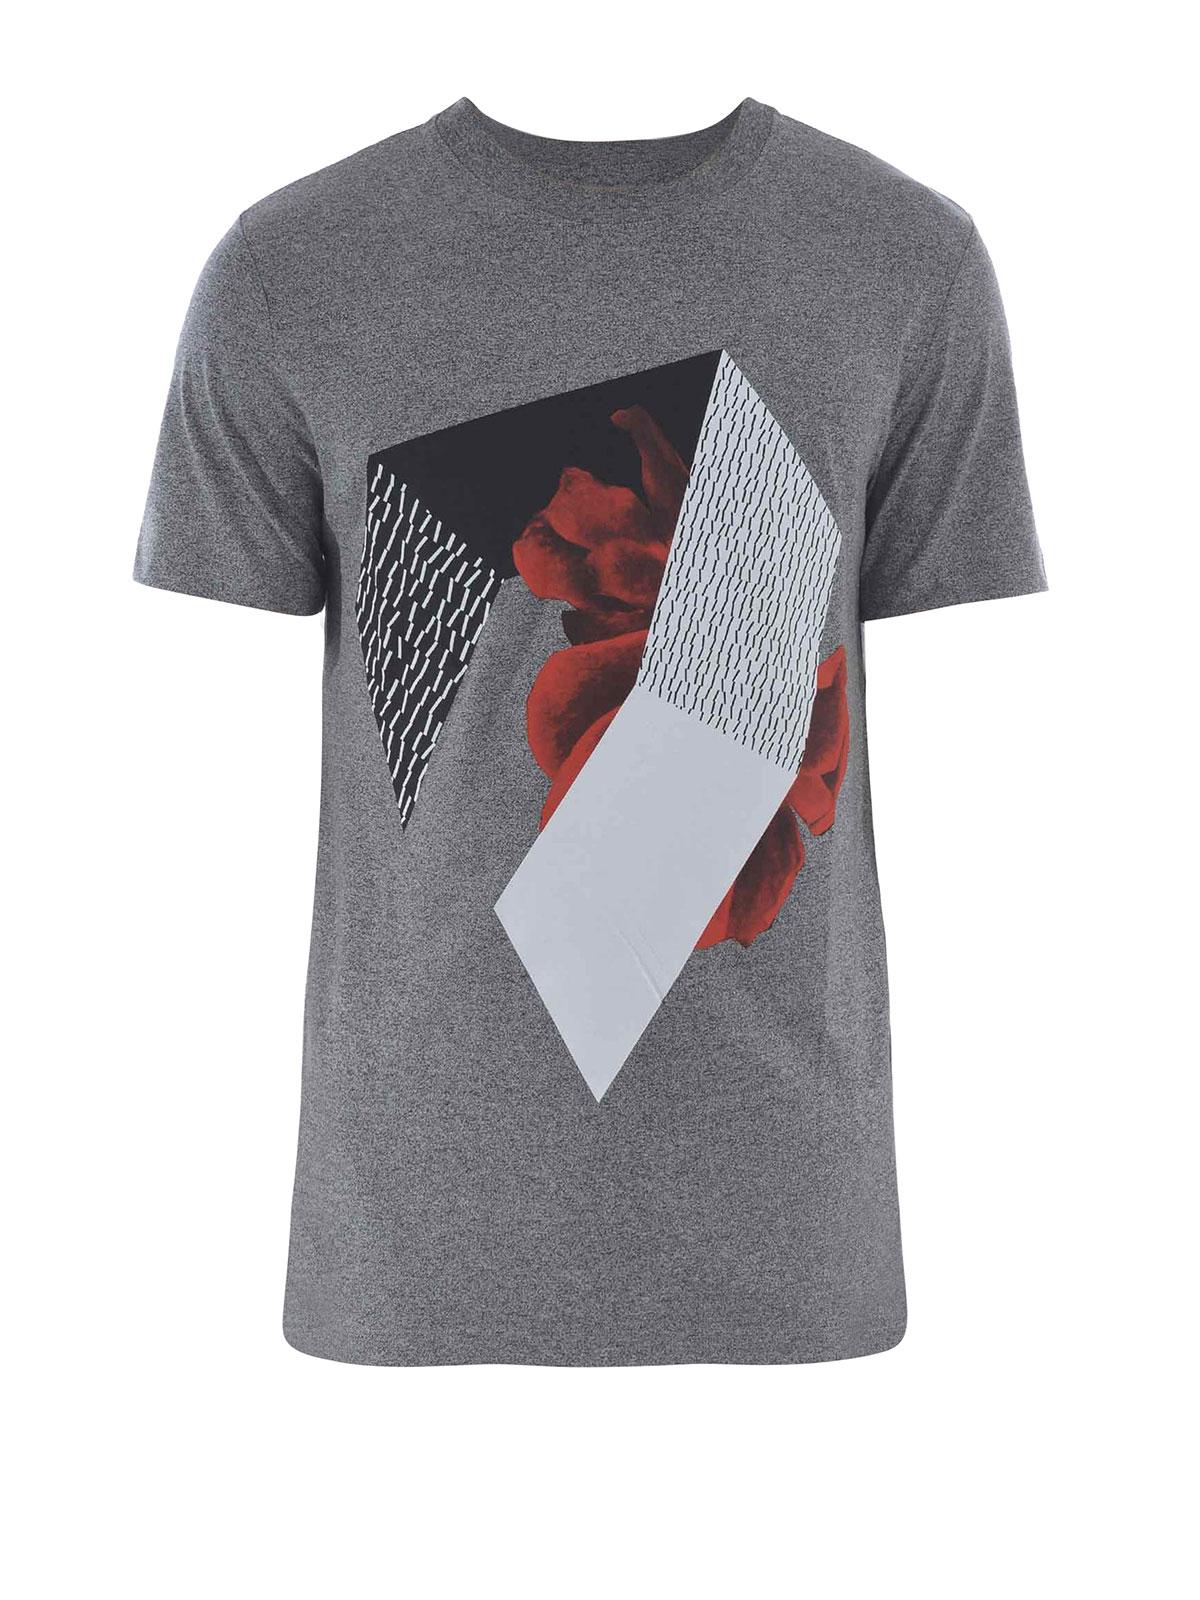 Geometric printed t shirt by mcq t shirts ikrix for Who prints t shirts